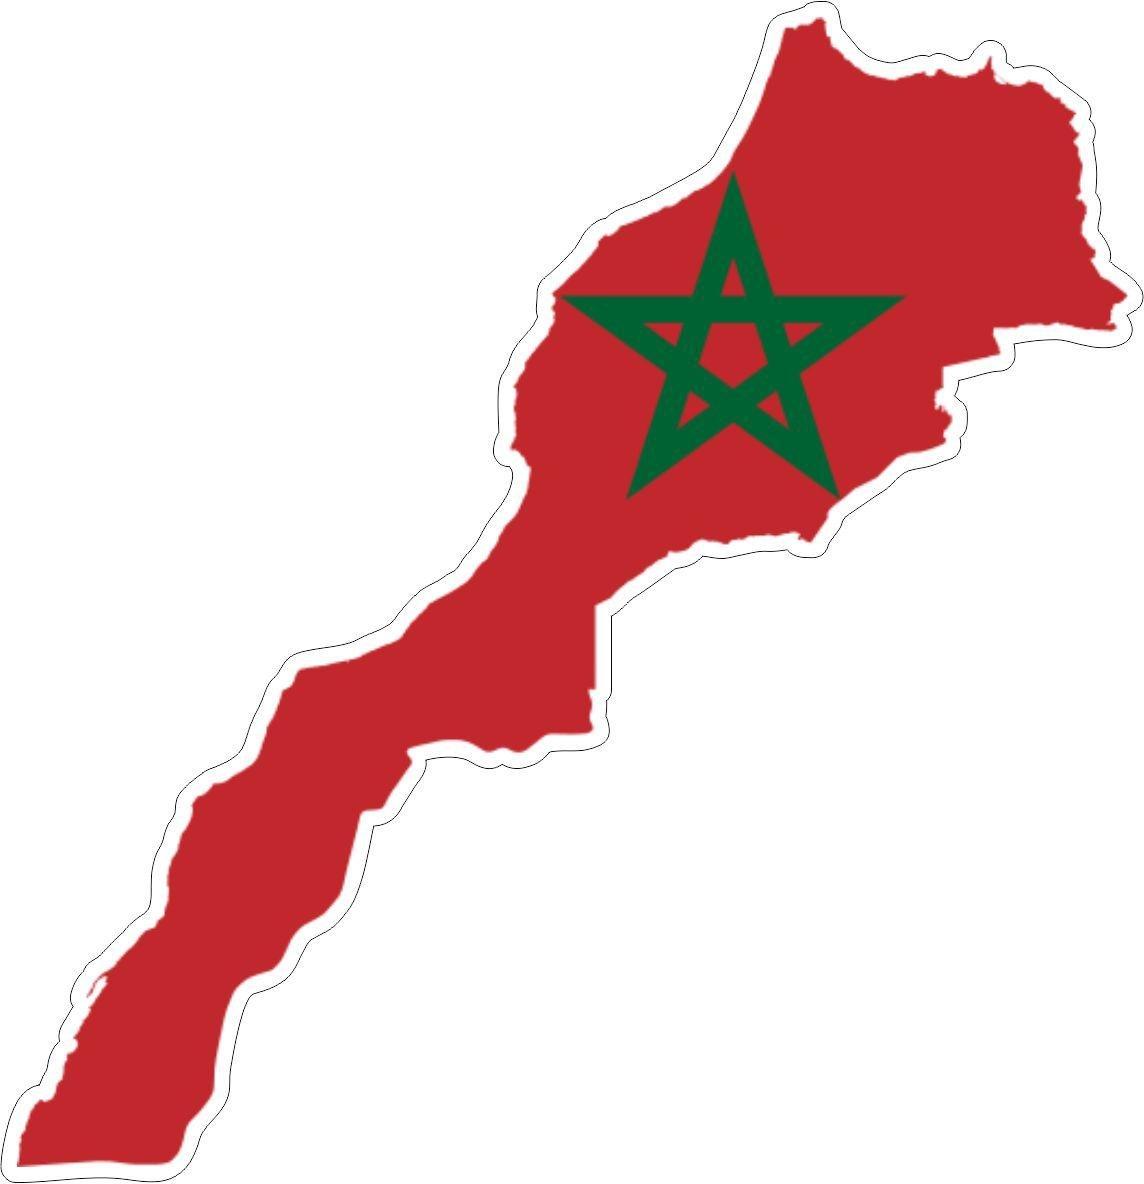 Autocollant blason adhesif drapeau armoiries voiture sticker maroc